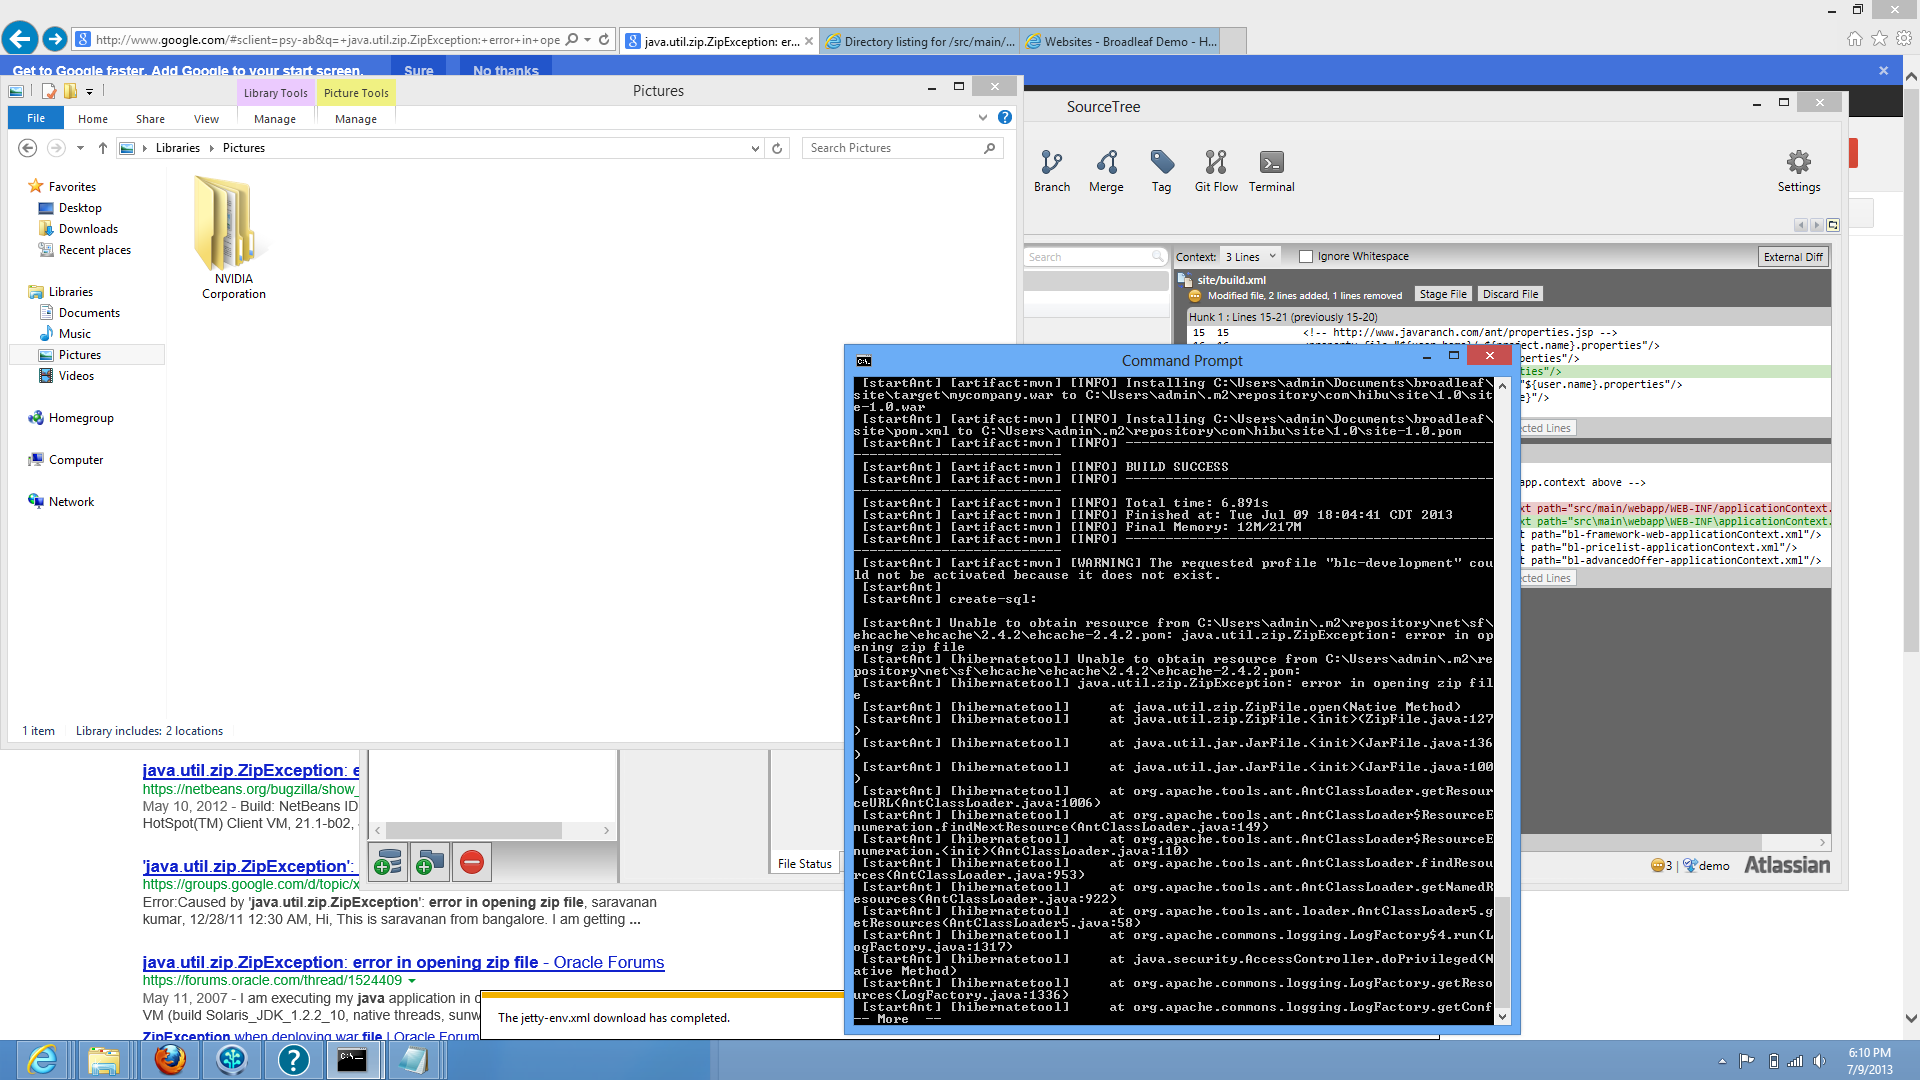 windows ant target build-create-sql causes infinite loop · Issue